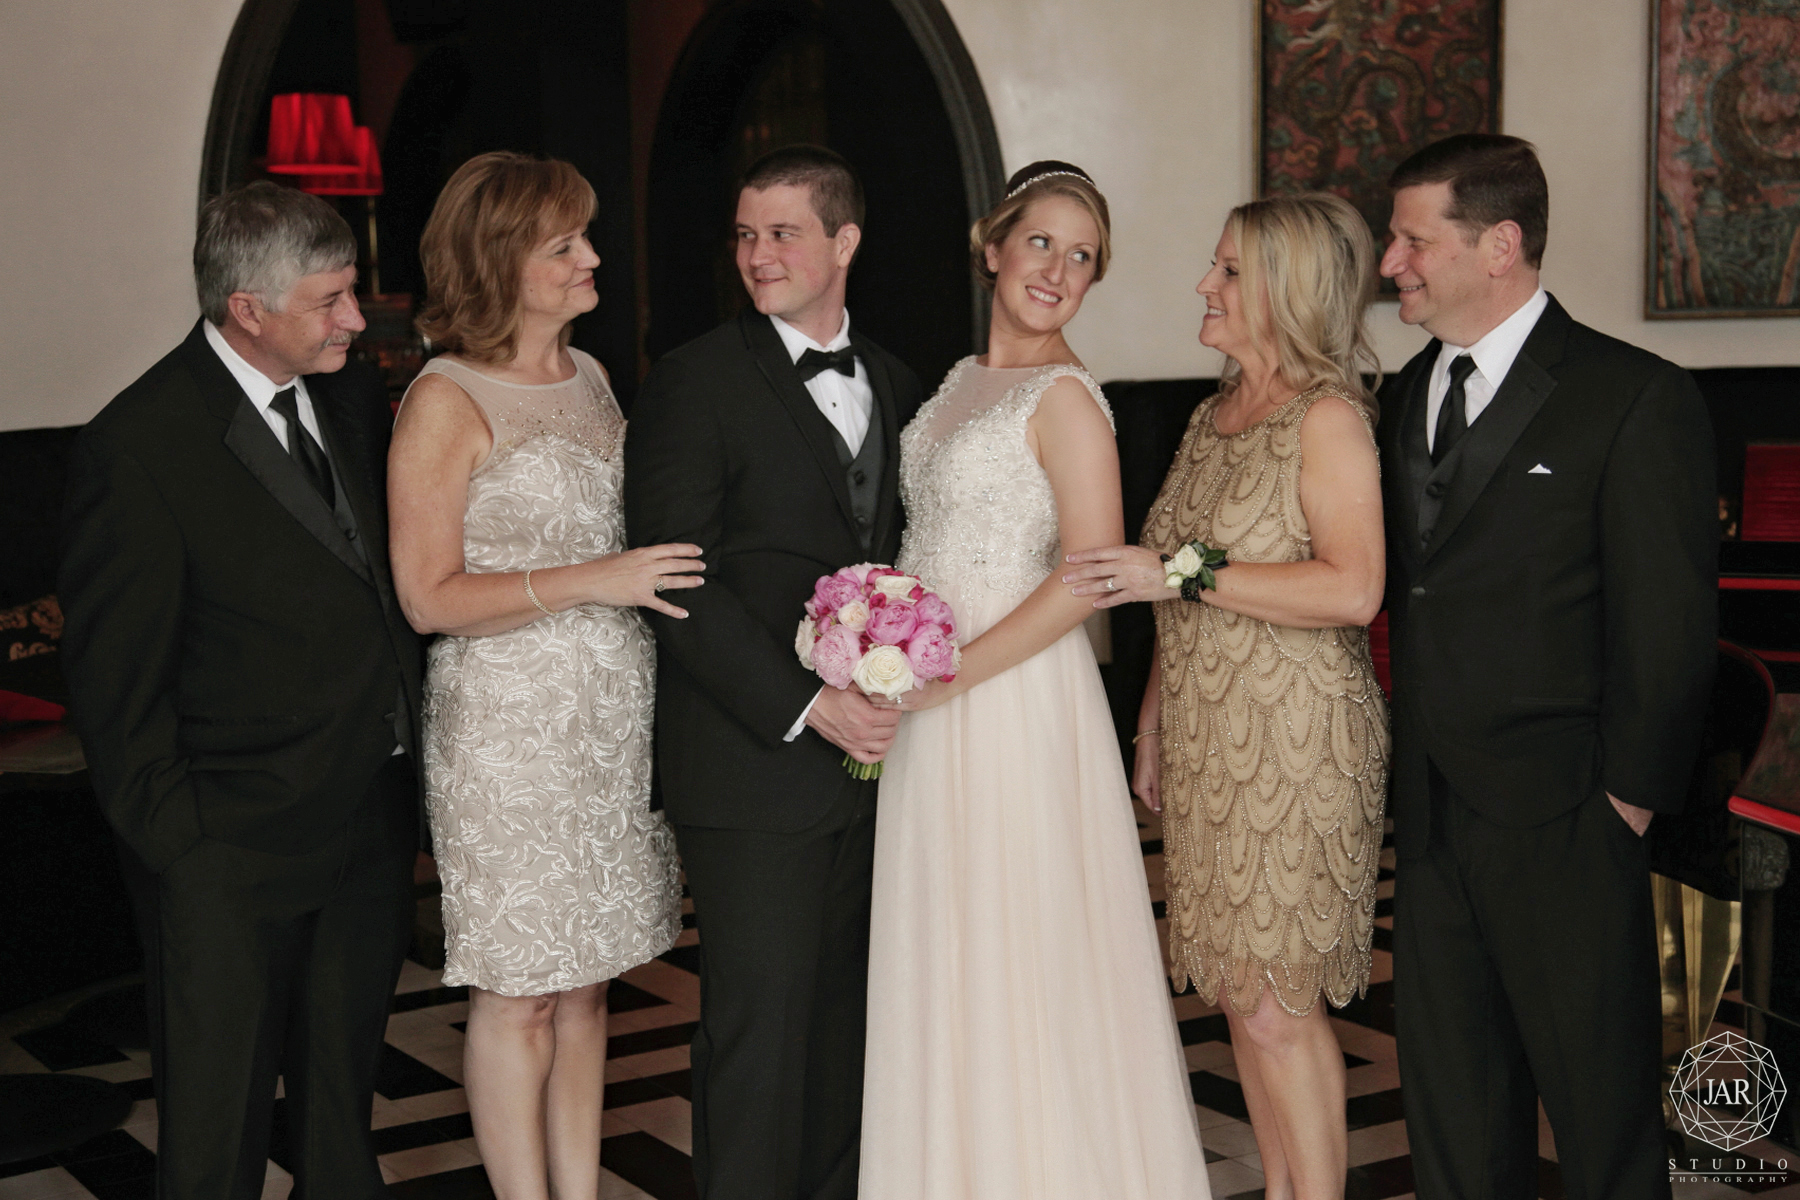 29-bridal-family-bösendorfer-lounge-jarstudio-photography-graond-bohemian.JPG